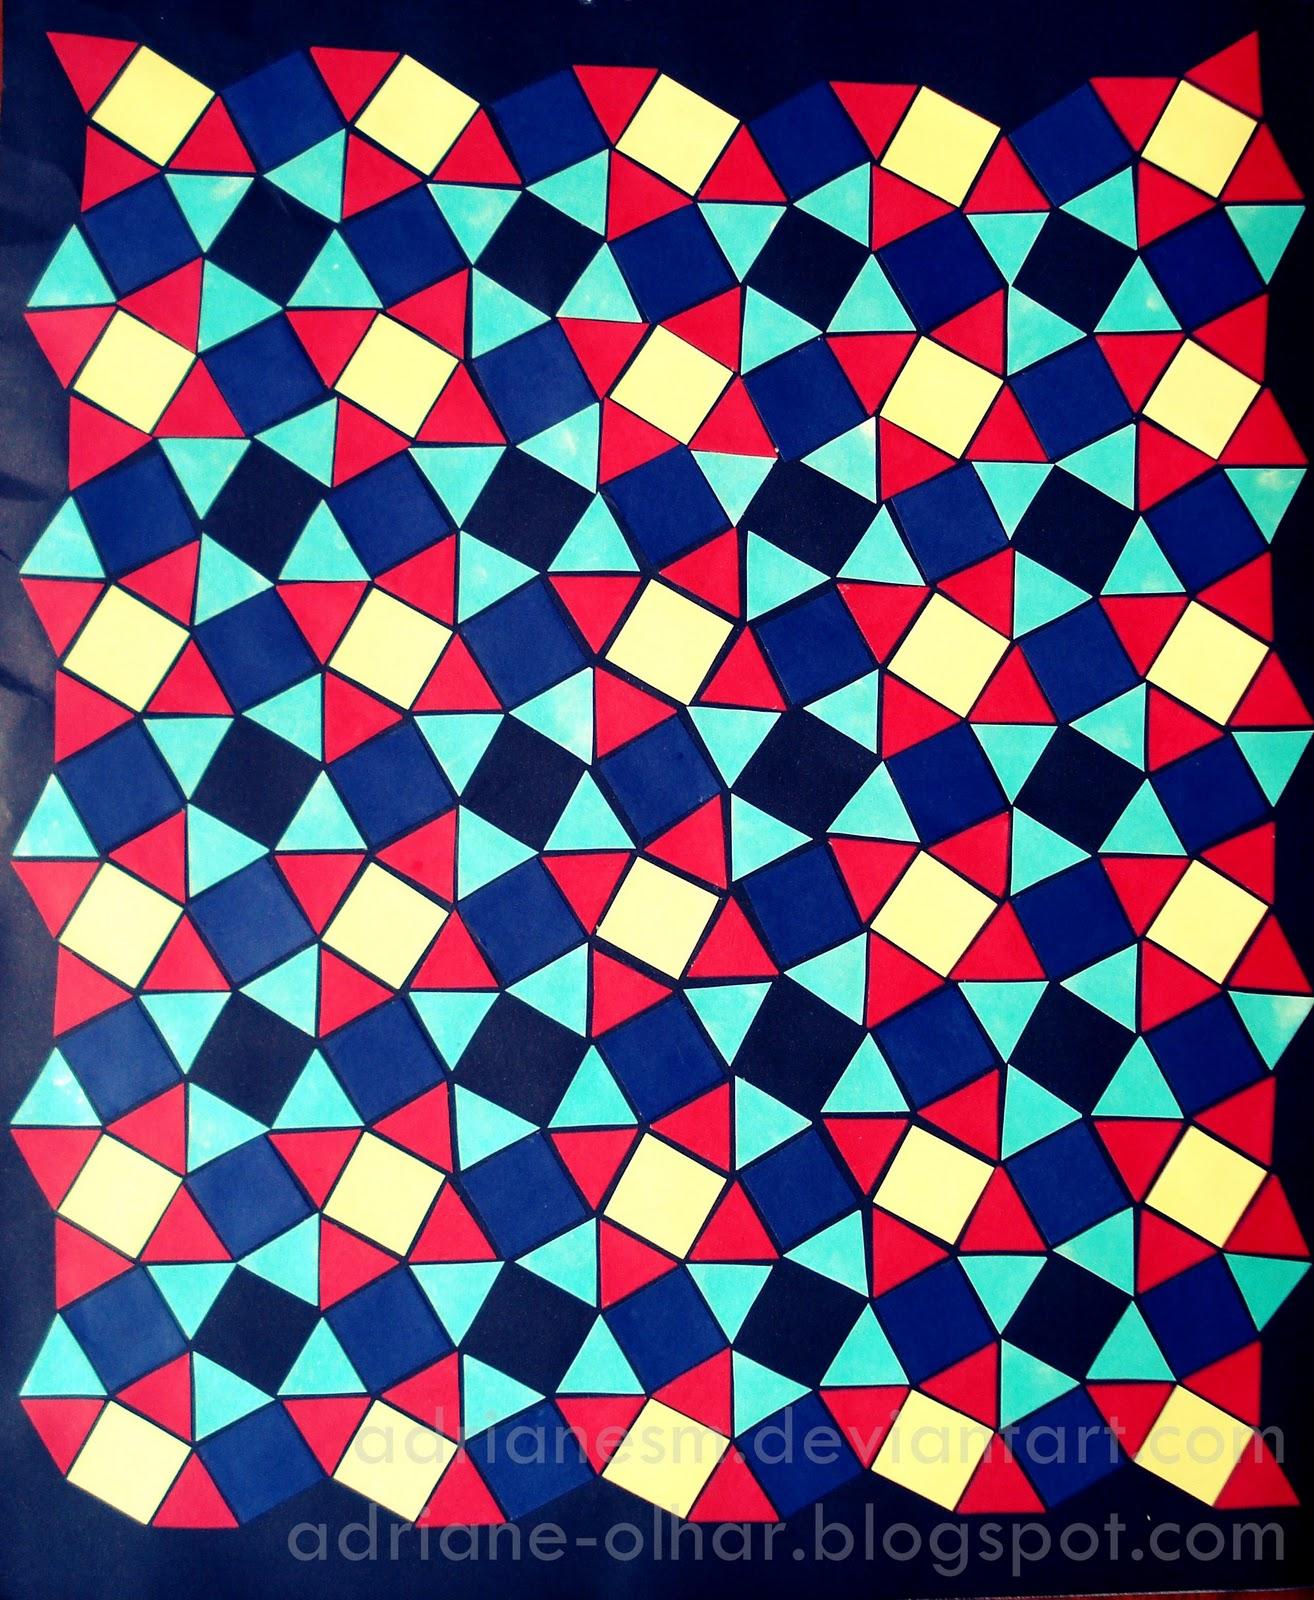 olhar adriane mascotti mosaico geométrico colagem